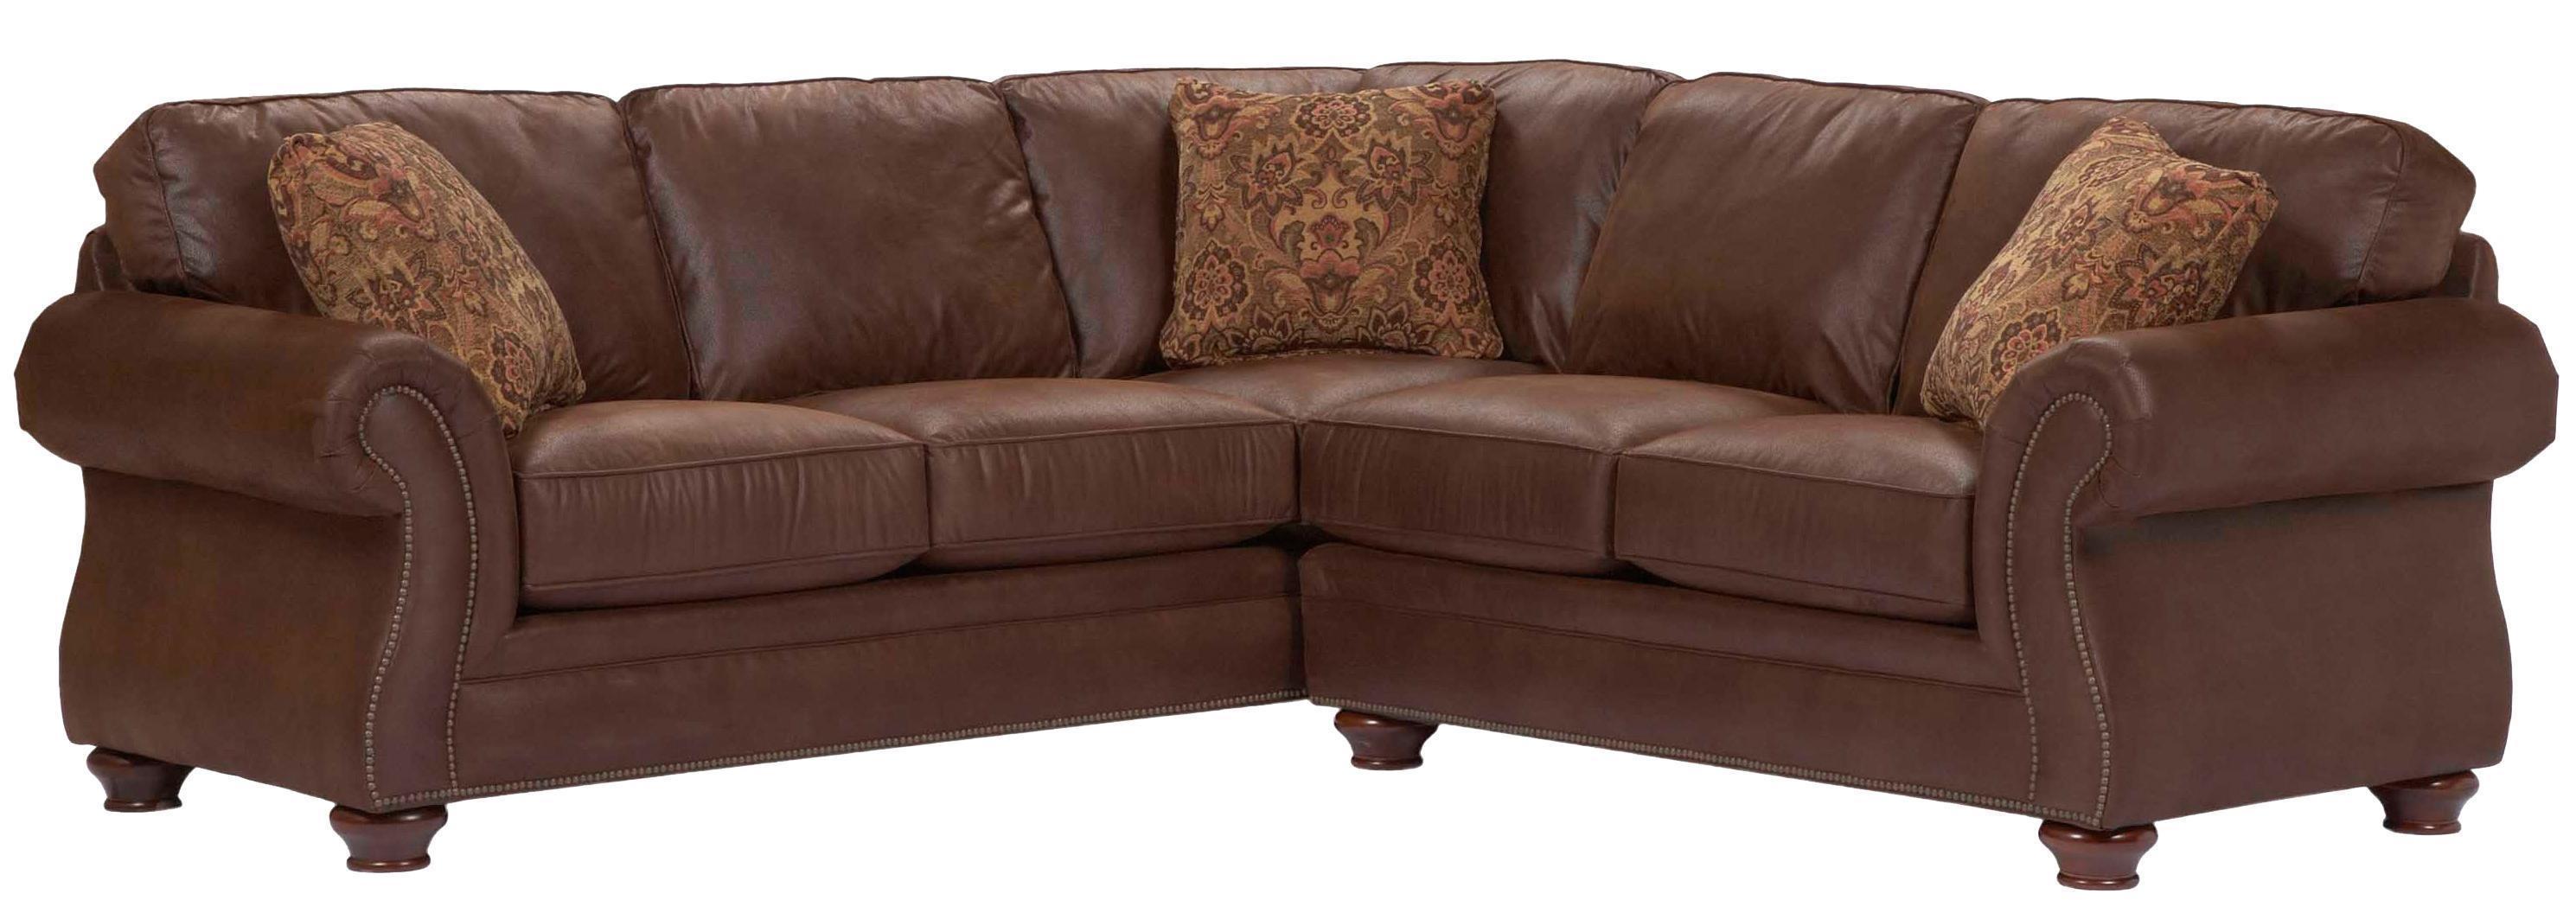 Broyhill Furniture Laramie 2 Piece Corner Sectional Sofa – Ahfa Regarding Broyhill Sectional Sofa (View 7 of 15)